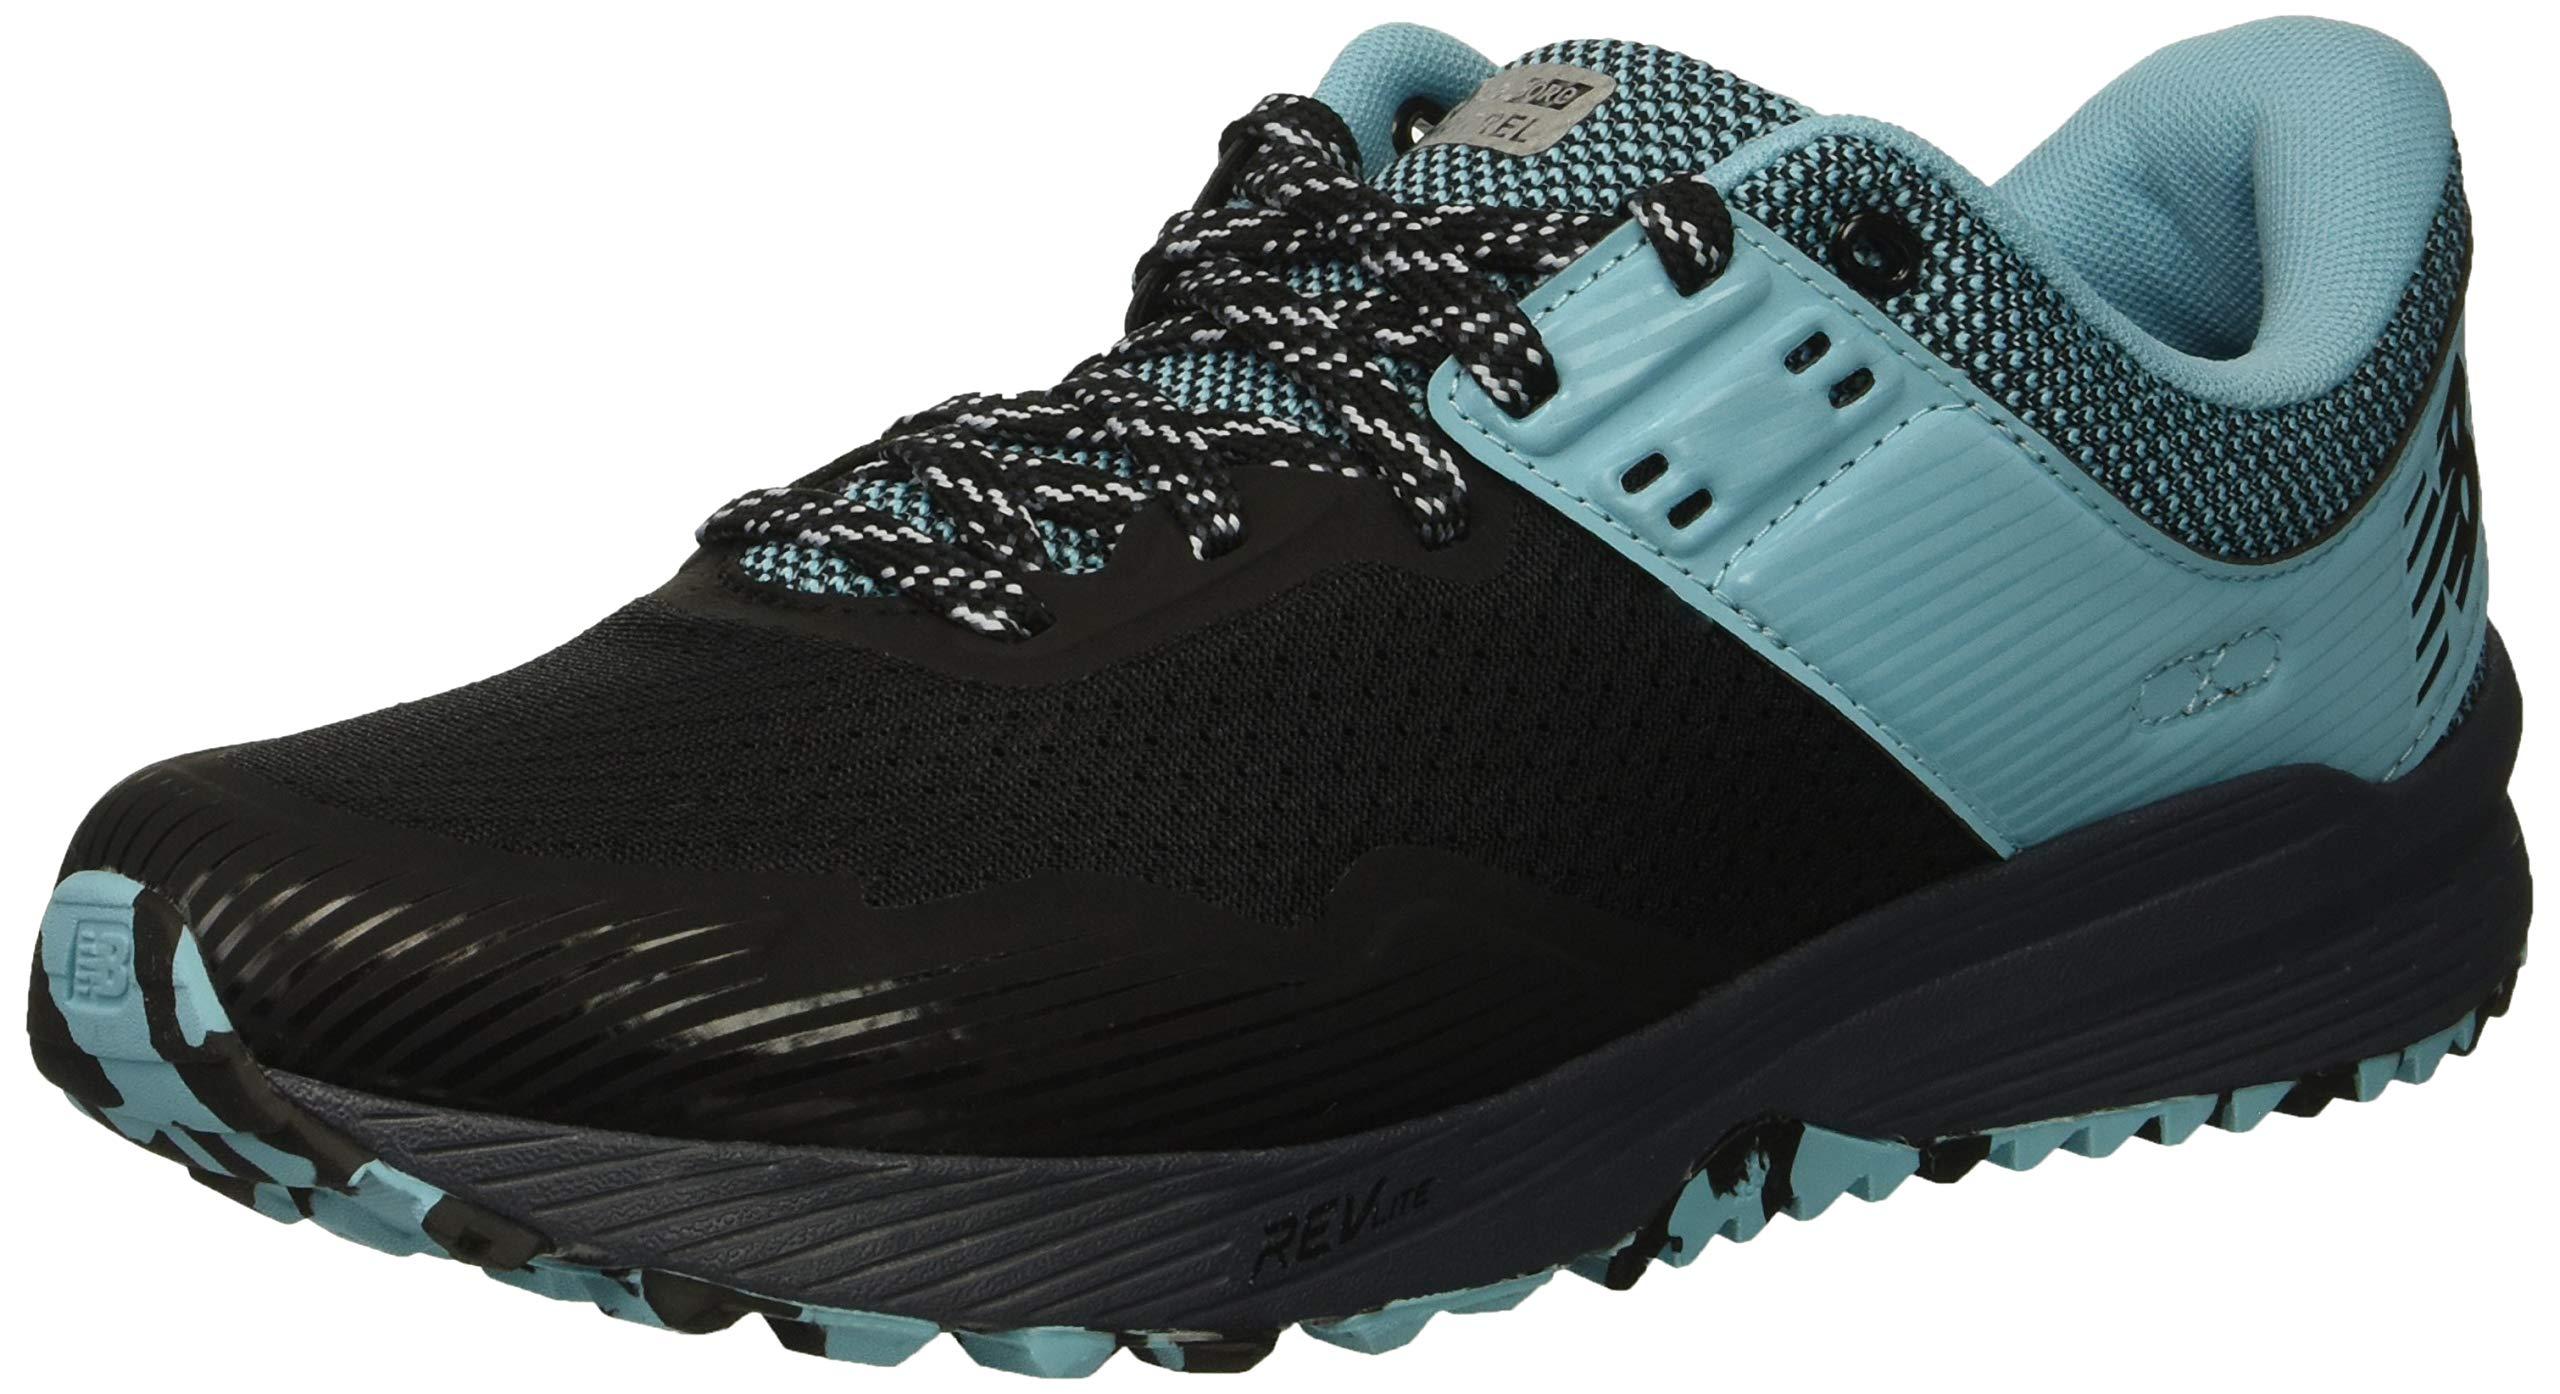 New Balance Women's Nitrel V2 FuelCore Trail Running Shoe Black/Thunder/Enamel Blue 5.5 B US by New Balance (Image #1)